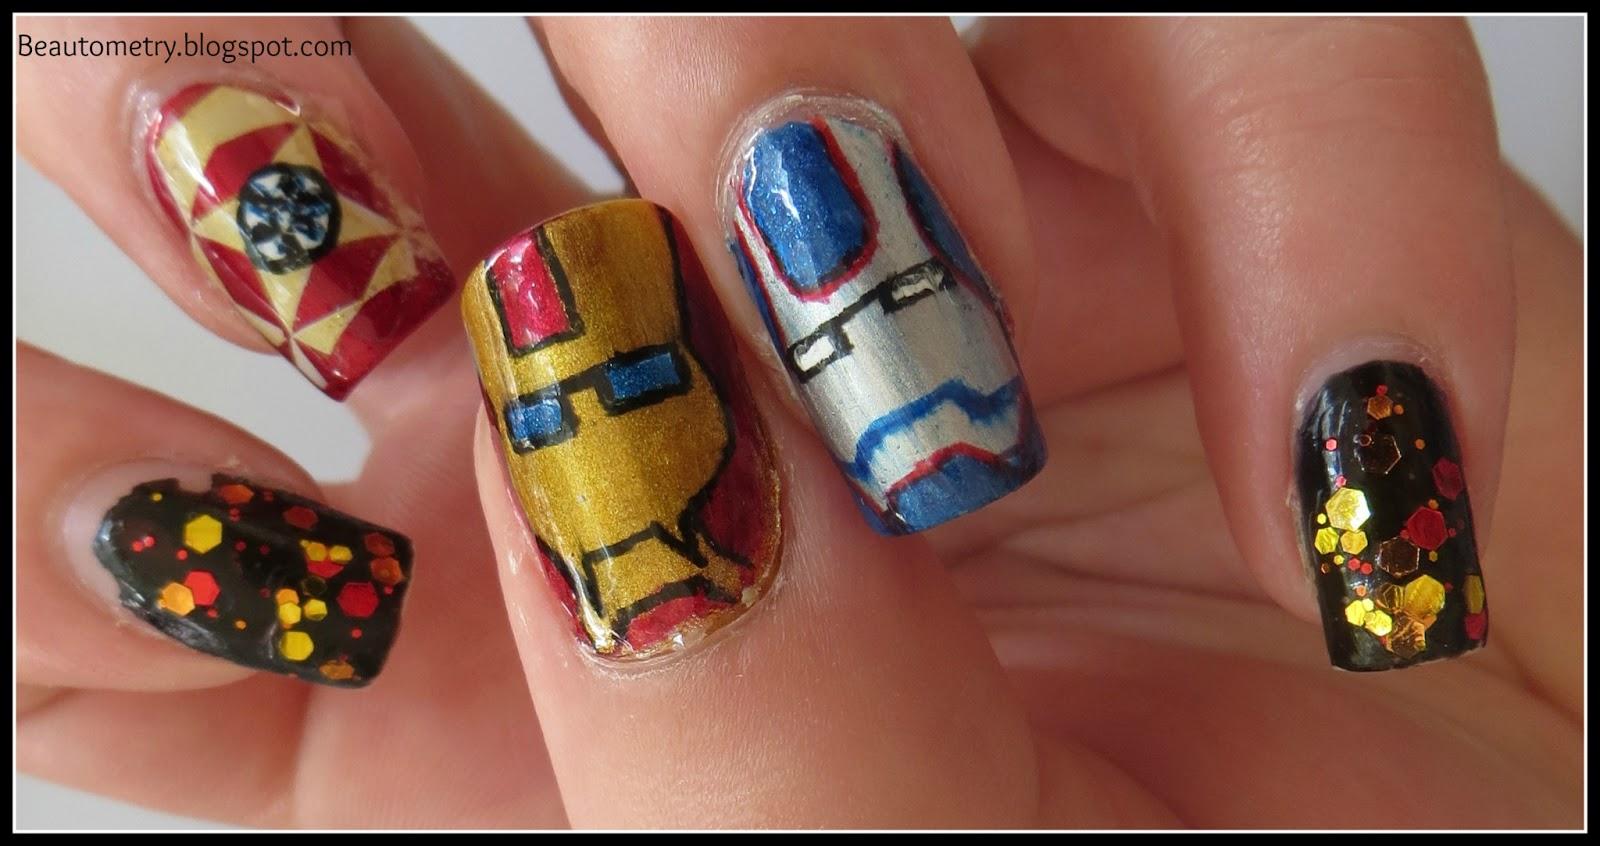 Beautometry: Iron Man 3 Movie Manicure + Tutorial!!